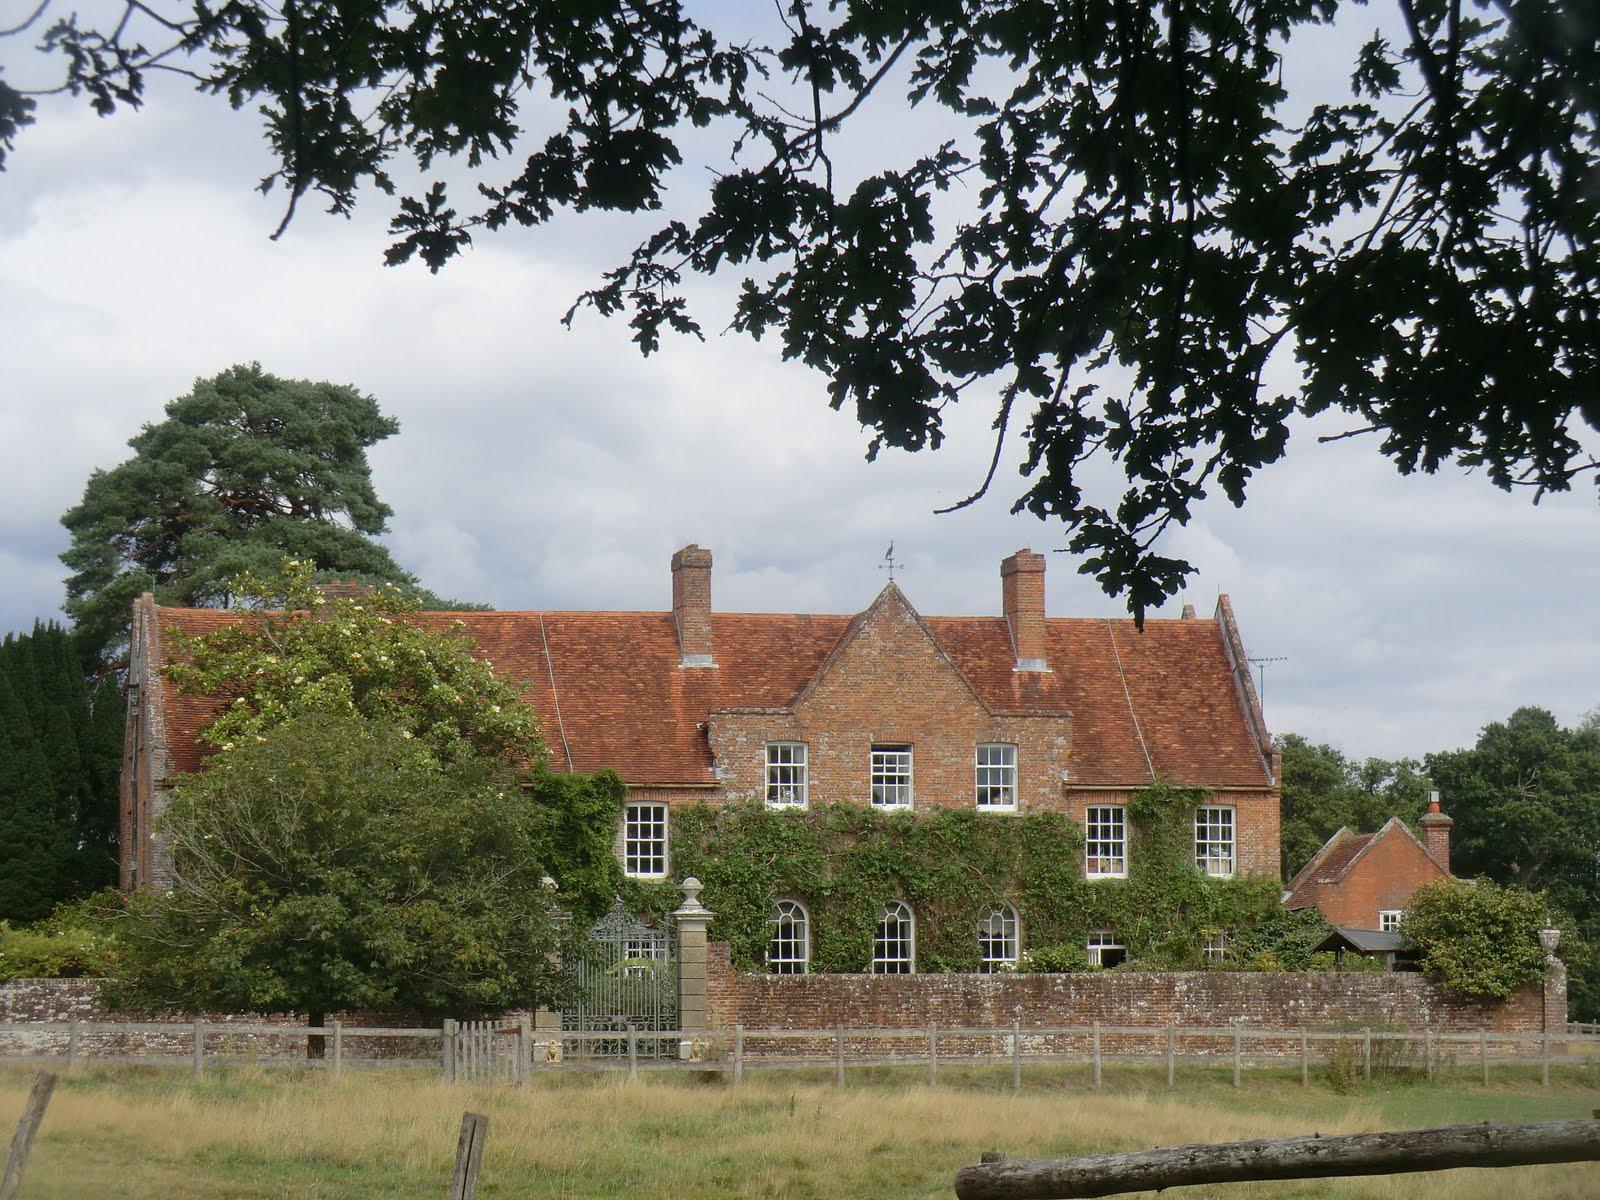 CIMG4285 Roydon Manor